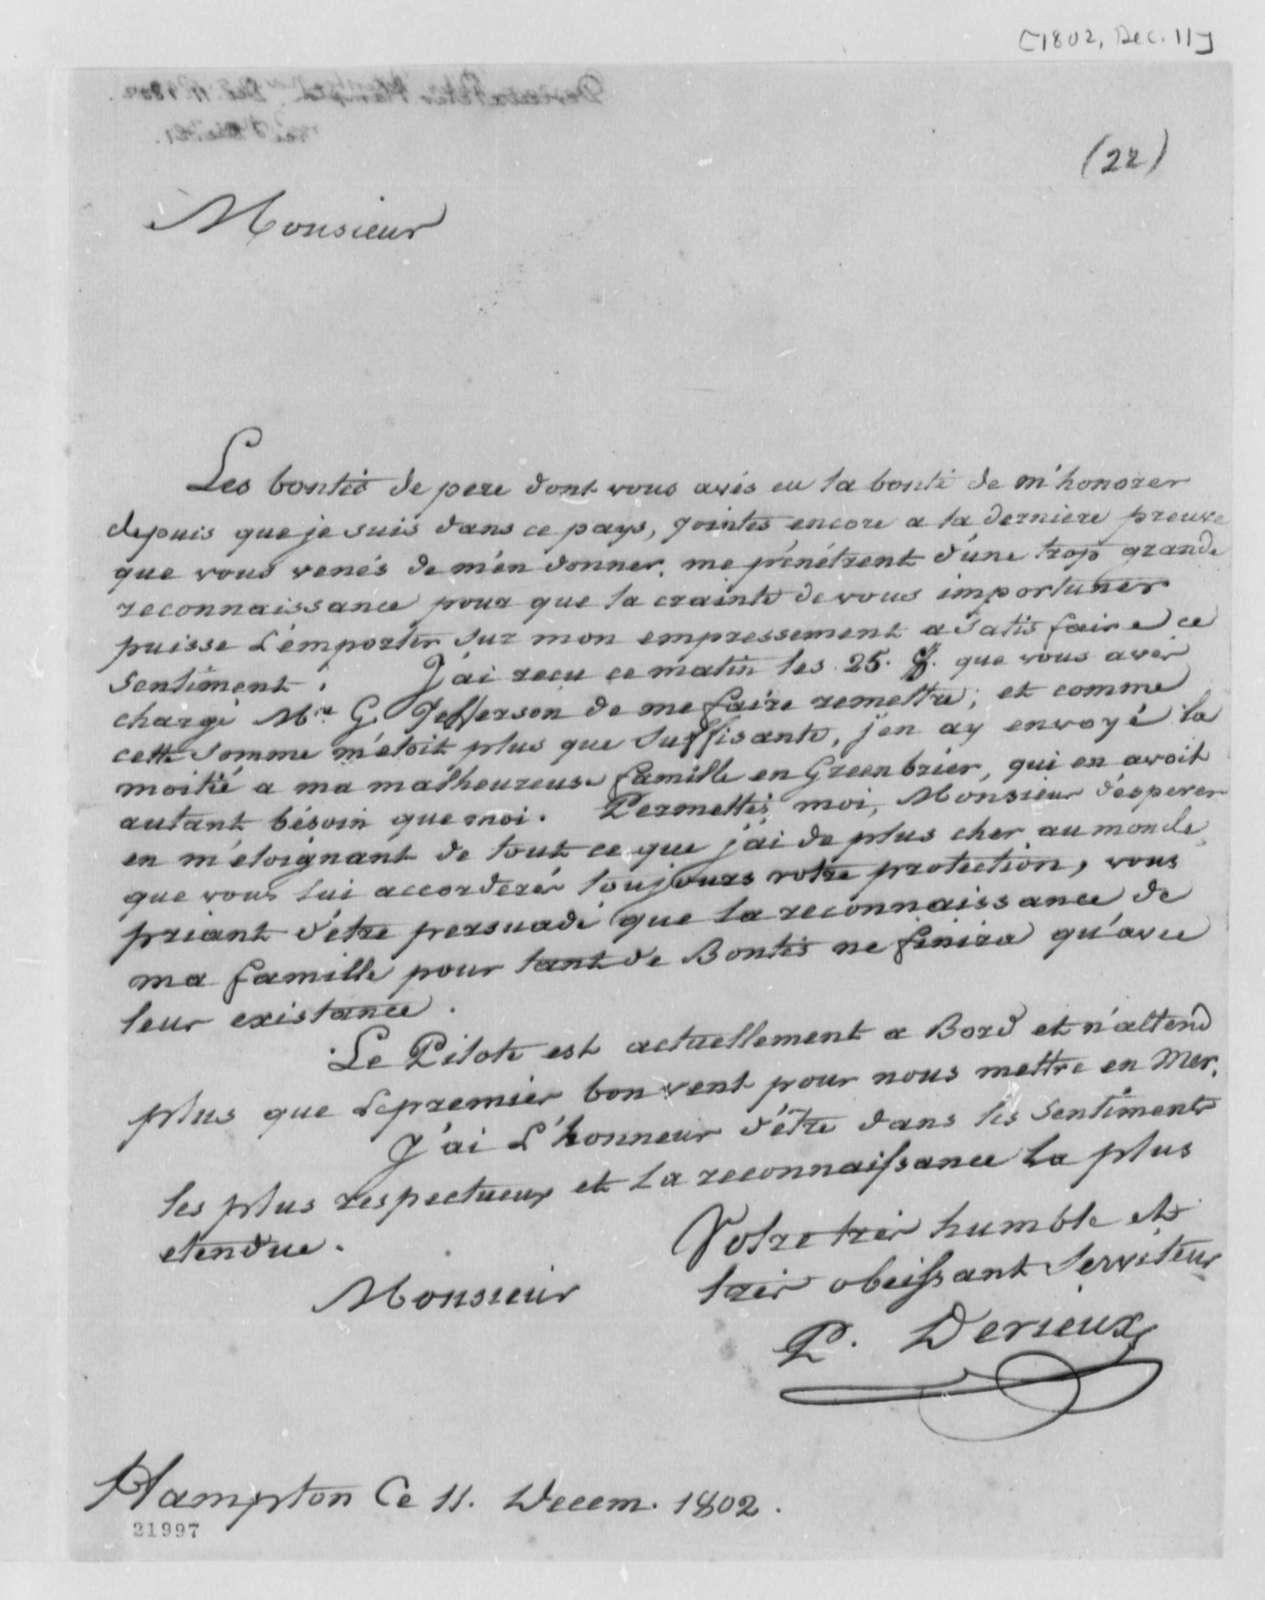 Justin Pierre Plumard Derieux to Thomas Jefferson, December 11, 1802, in French